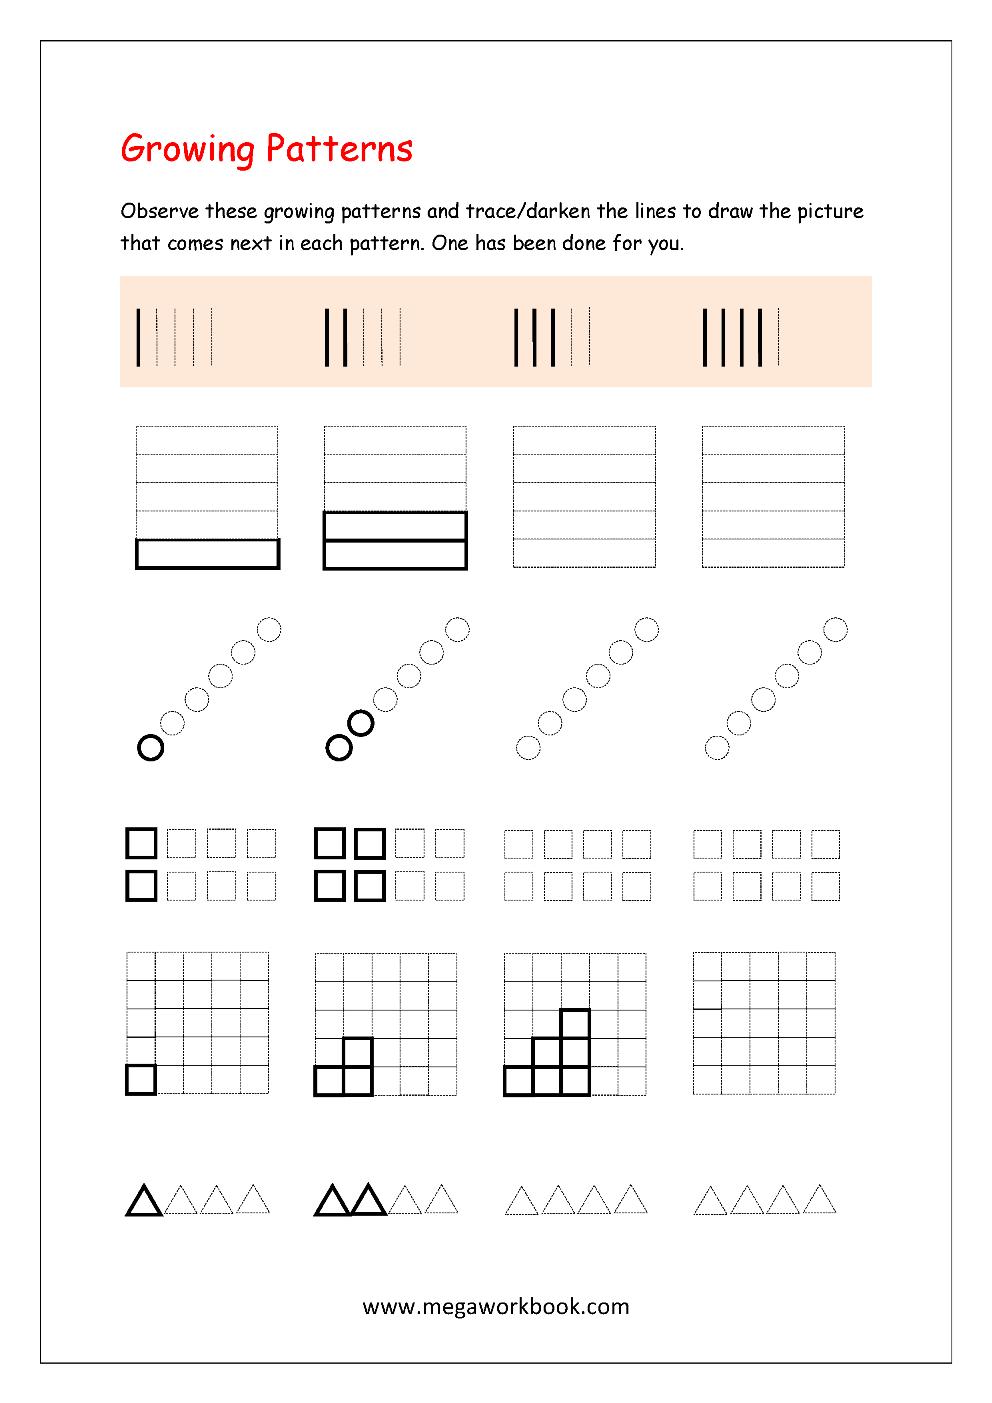 medium resolution of Free Printable Worksheets for Preschool and Kindergarten - MegaWorkbook